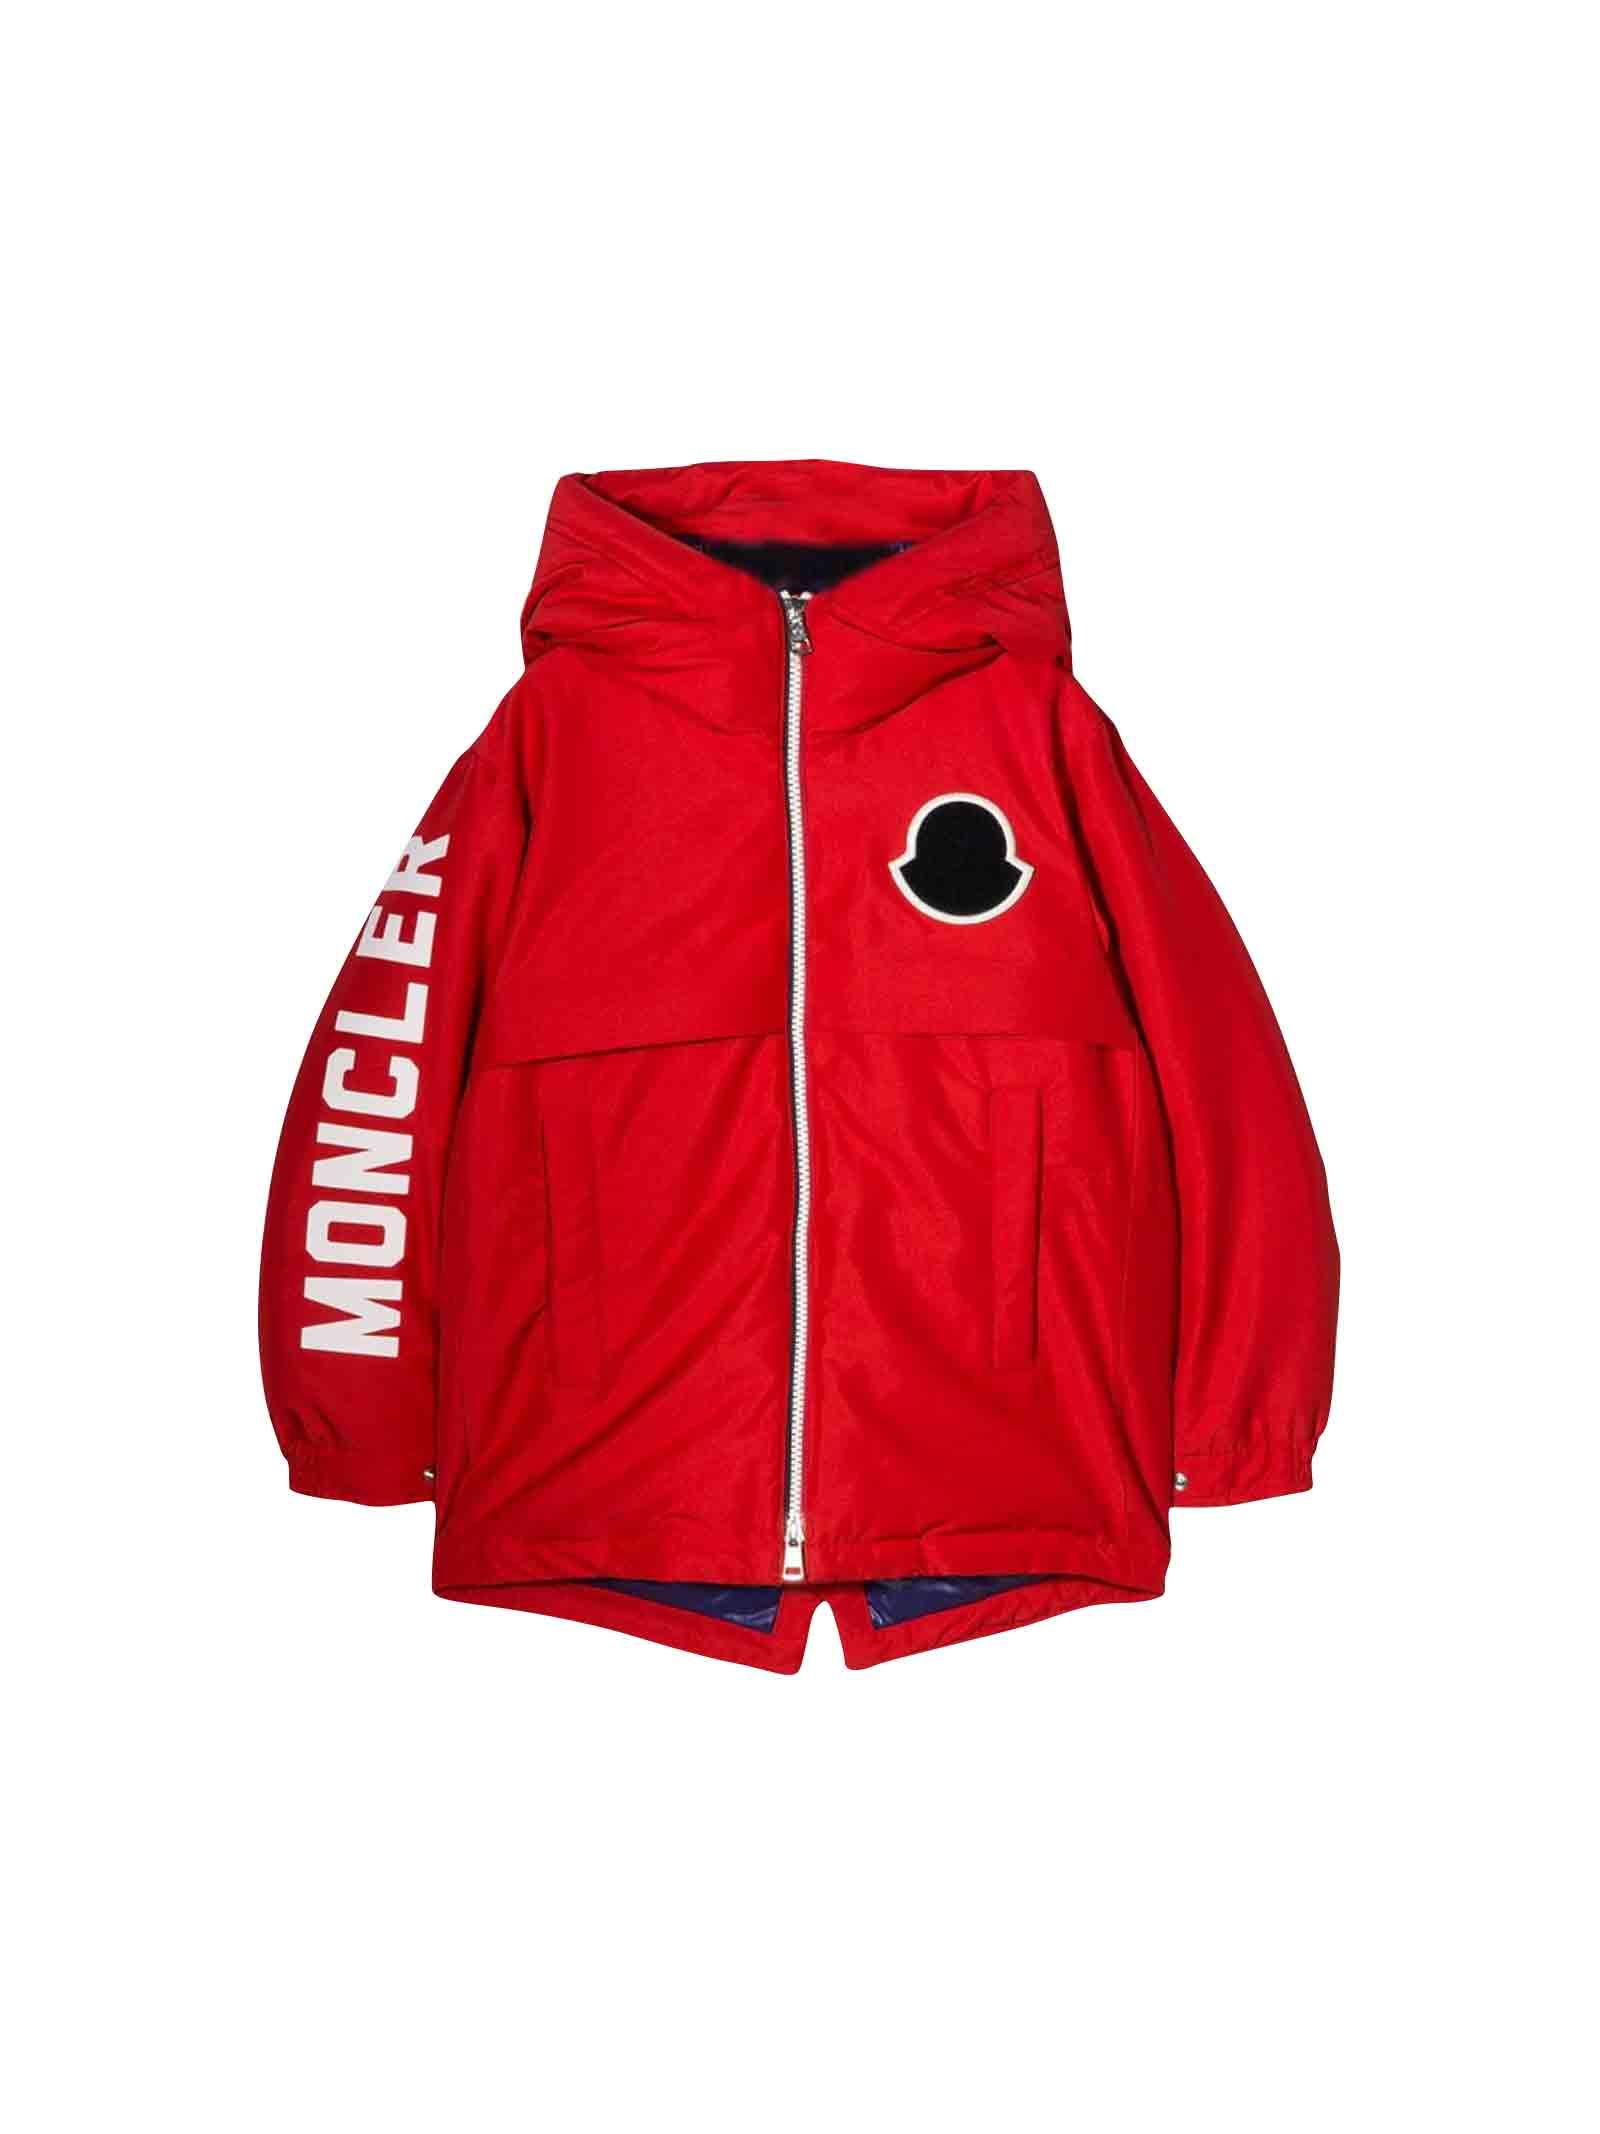 new style 69273 7c1ed Giubbotto rosso airon bambino Moncler kids